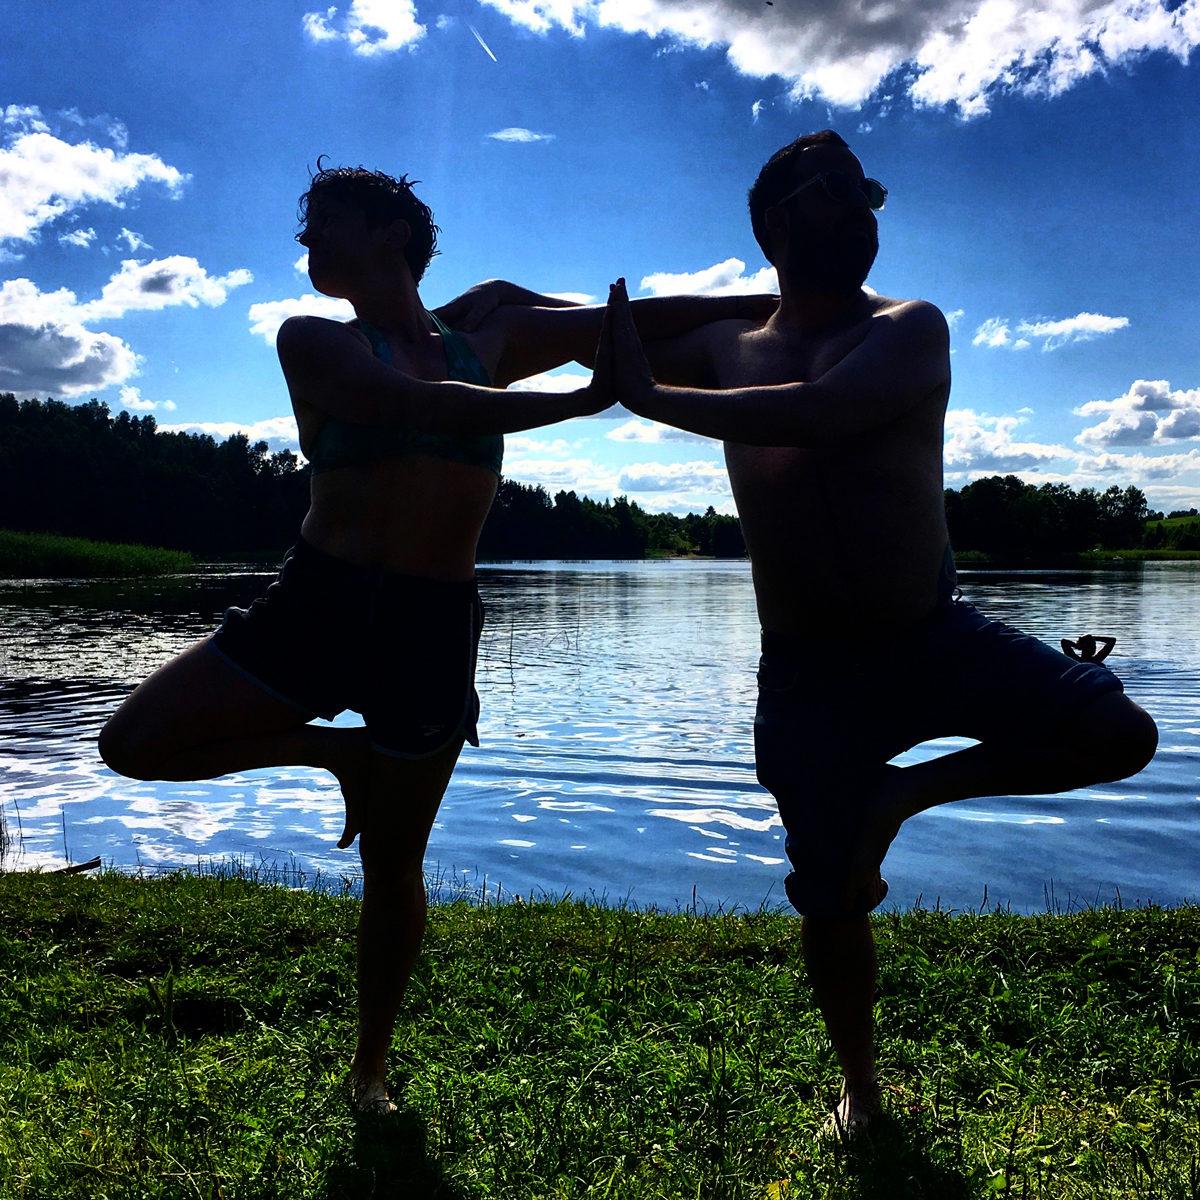 <p>Alexx Shilling and Rob Adler Peckerar on Boksze Lake, Poland, July 2017. Photo: Lydia&nbsp;Ivanovic.</p>